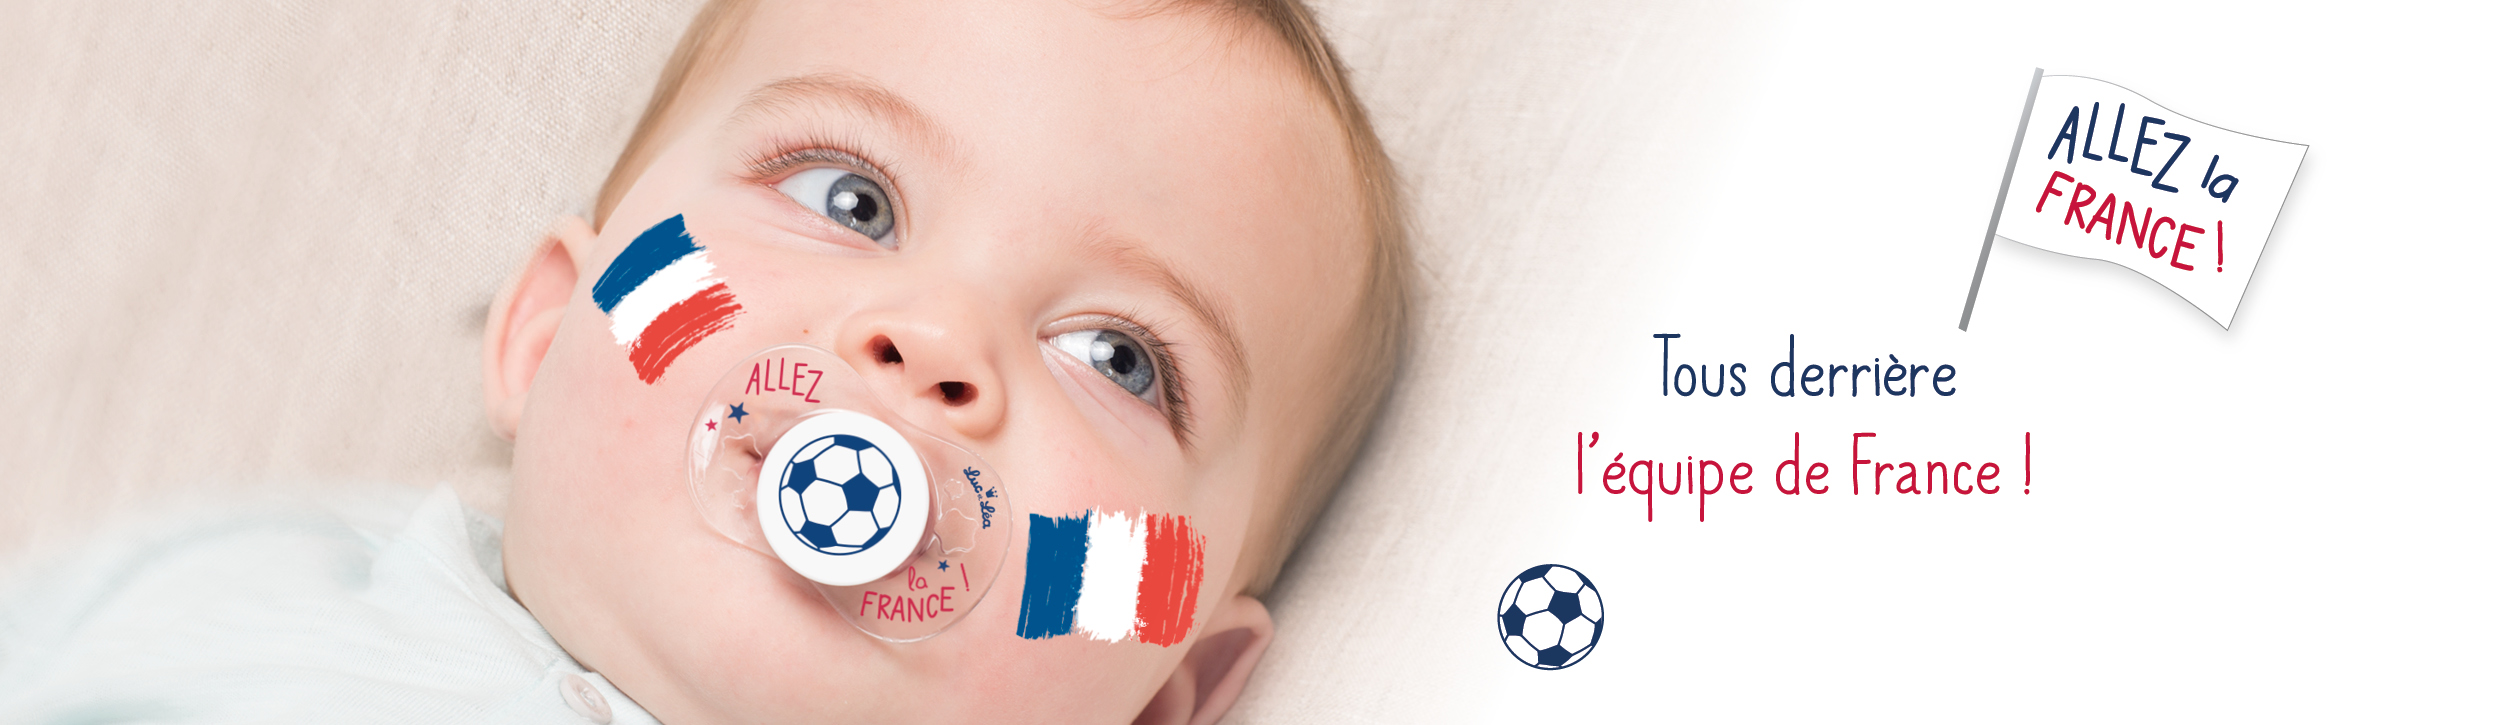 Sucettes Les Petits Supporters